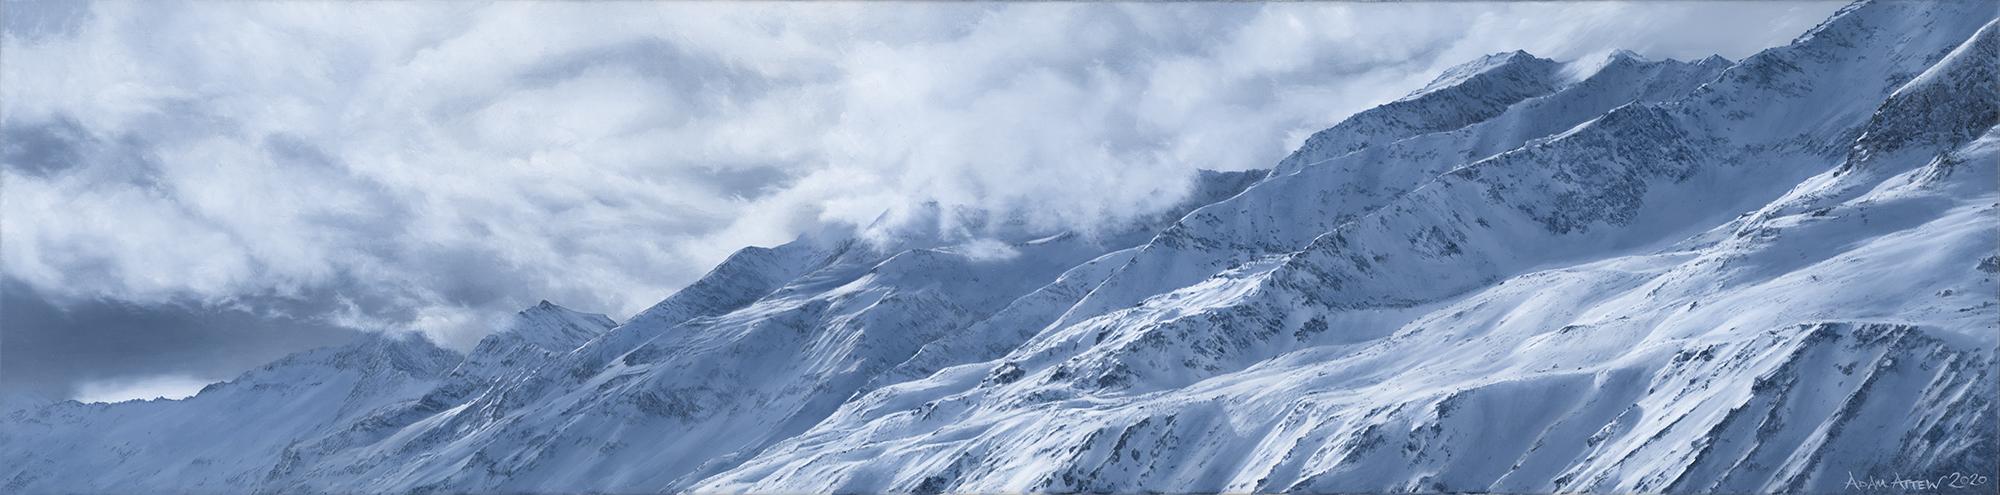 Austria Obergurgl Attew Painting Landscape artist art ski snowboard mountain winter Snow Alpine Alps Montagne Alpes